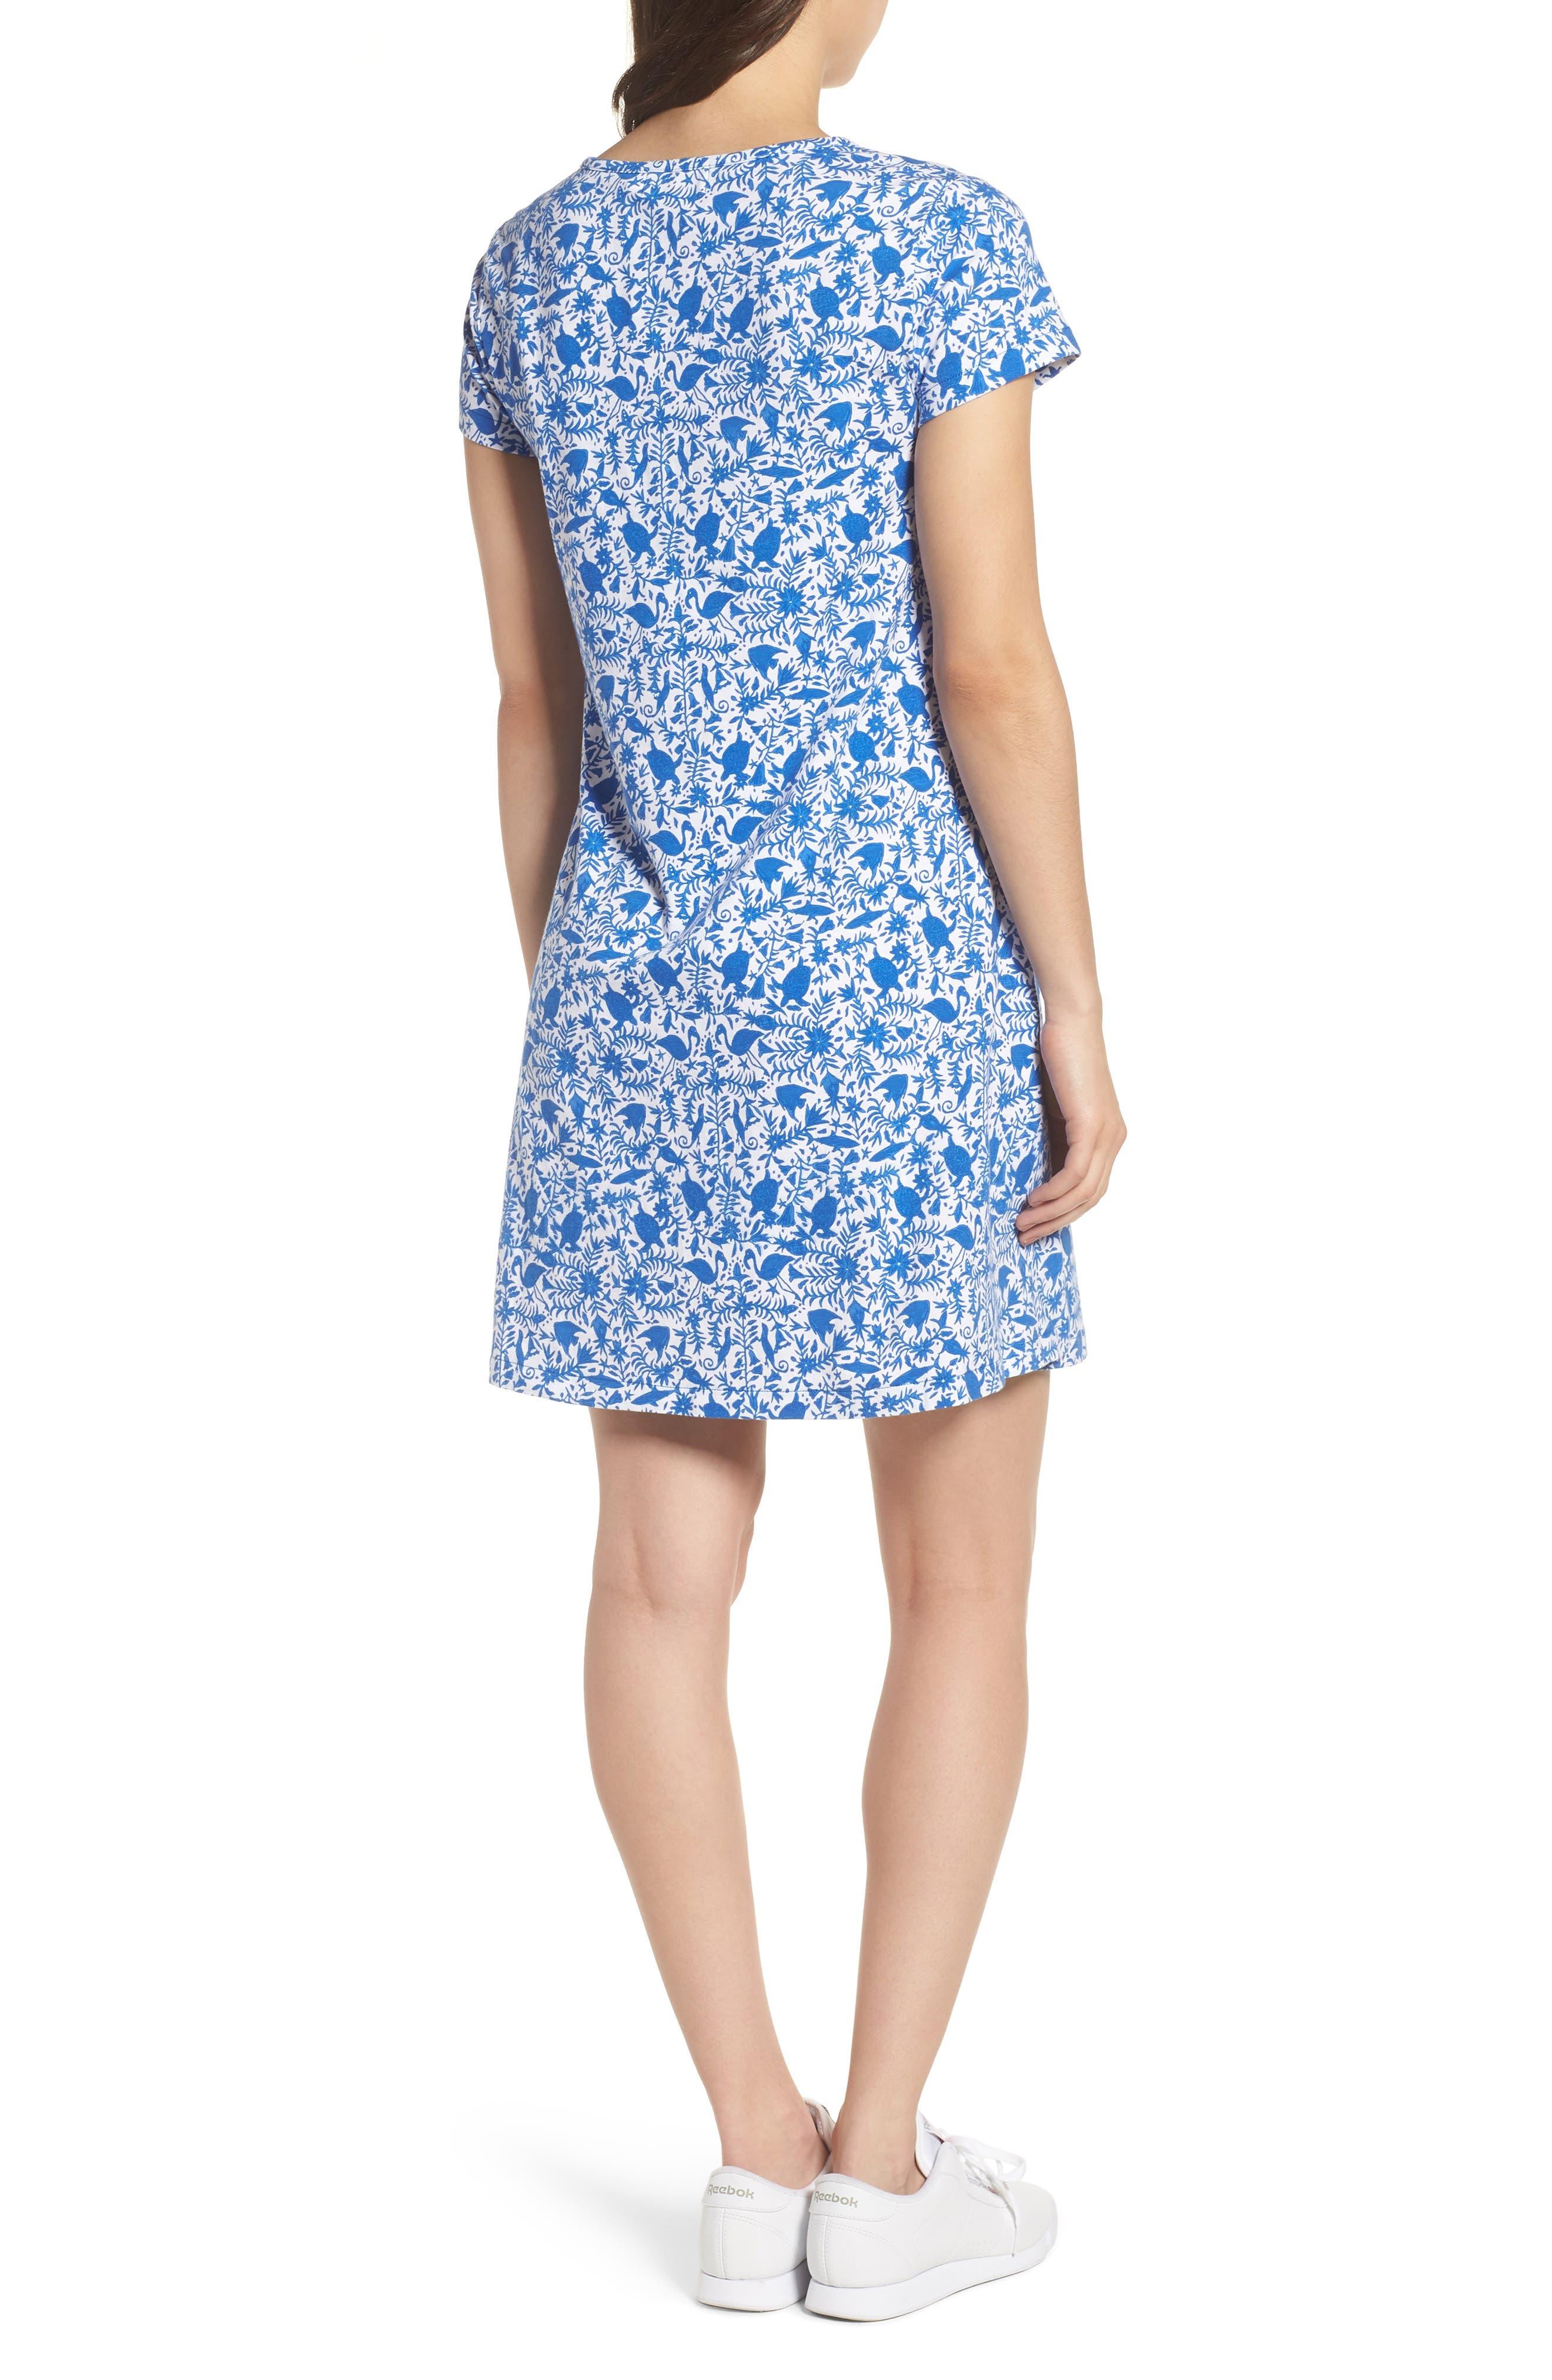 Bahamas Otomi Print Stretch Cotton Dress,                             Alternate thumbnail 2, color,                             Yacht Blue